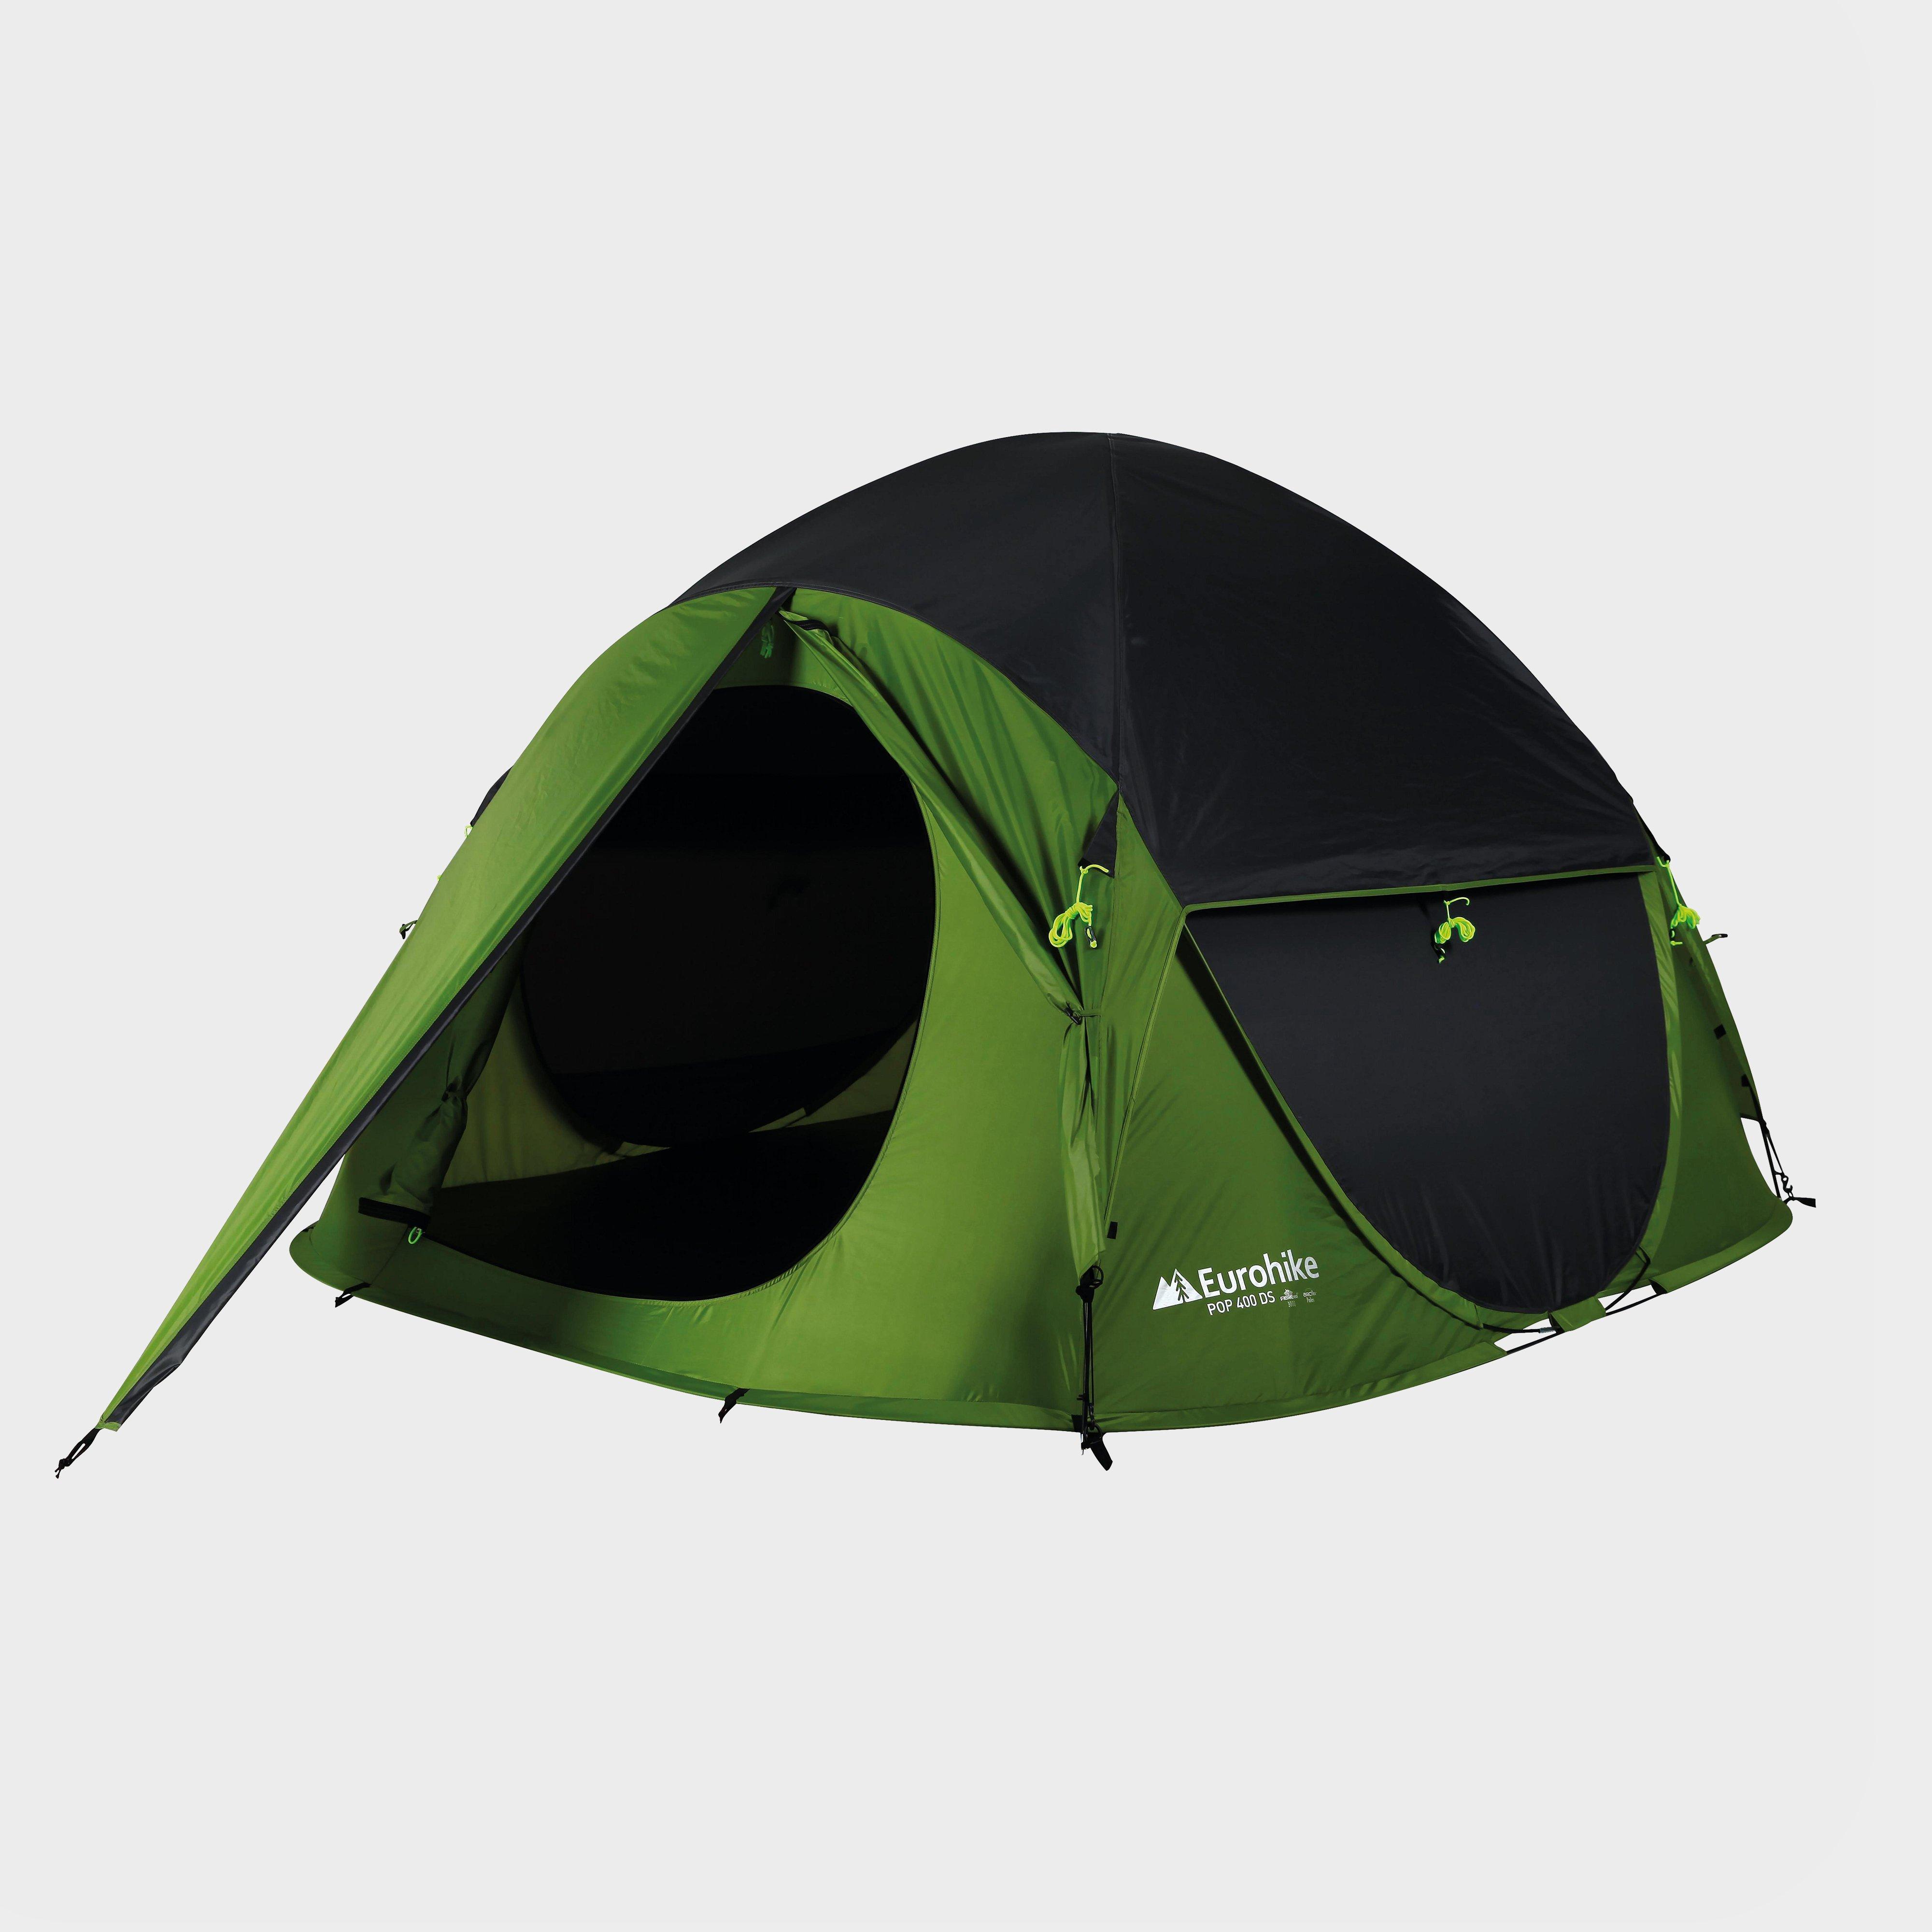 Eurohike Avon Deluxe Black Coded Fibreglass Bedroom Tent Pole Run